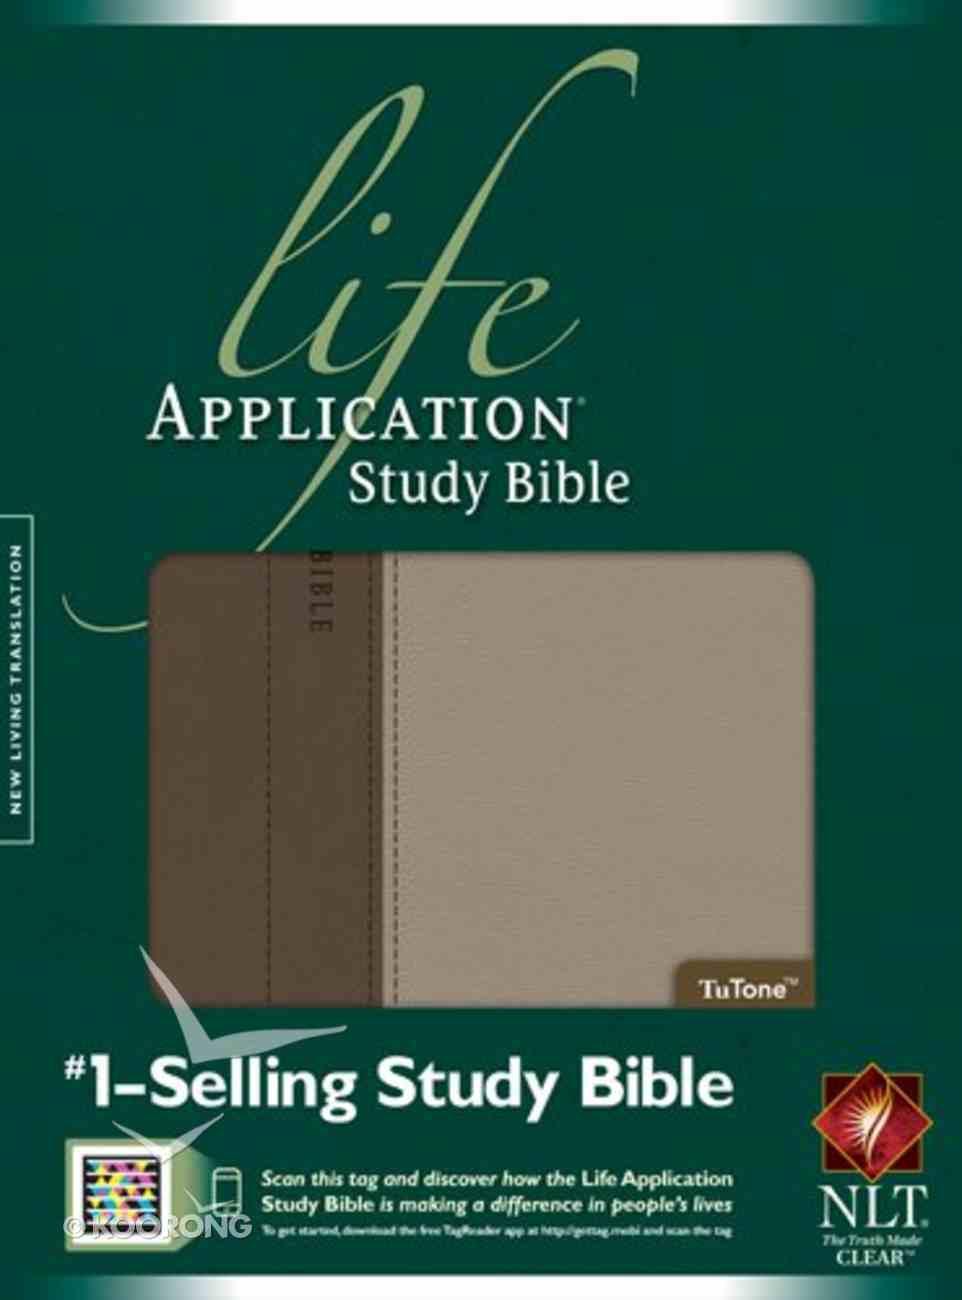 NLT Life Application Study Bible Taupe/Stone Imitation Leather